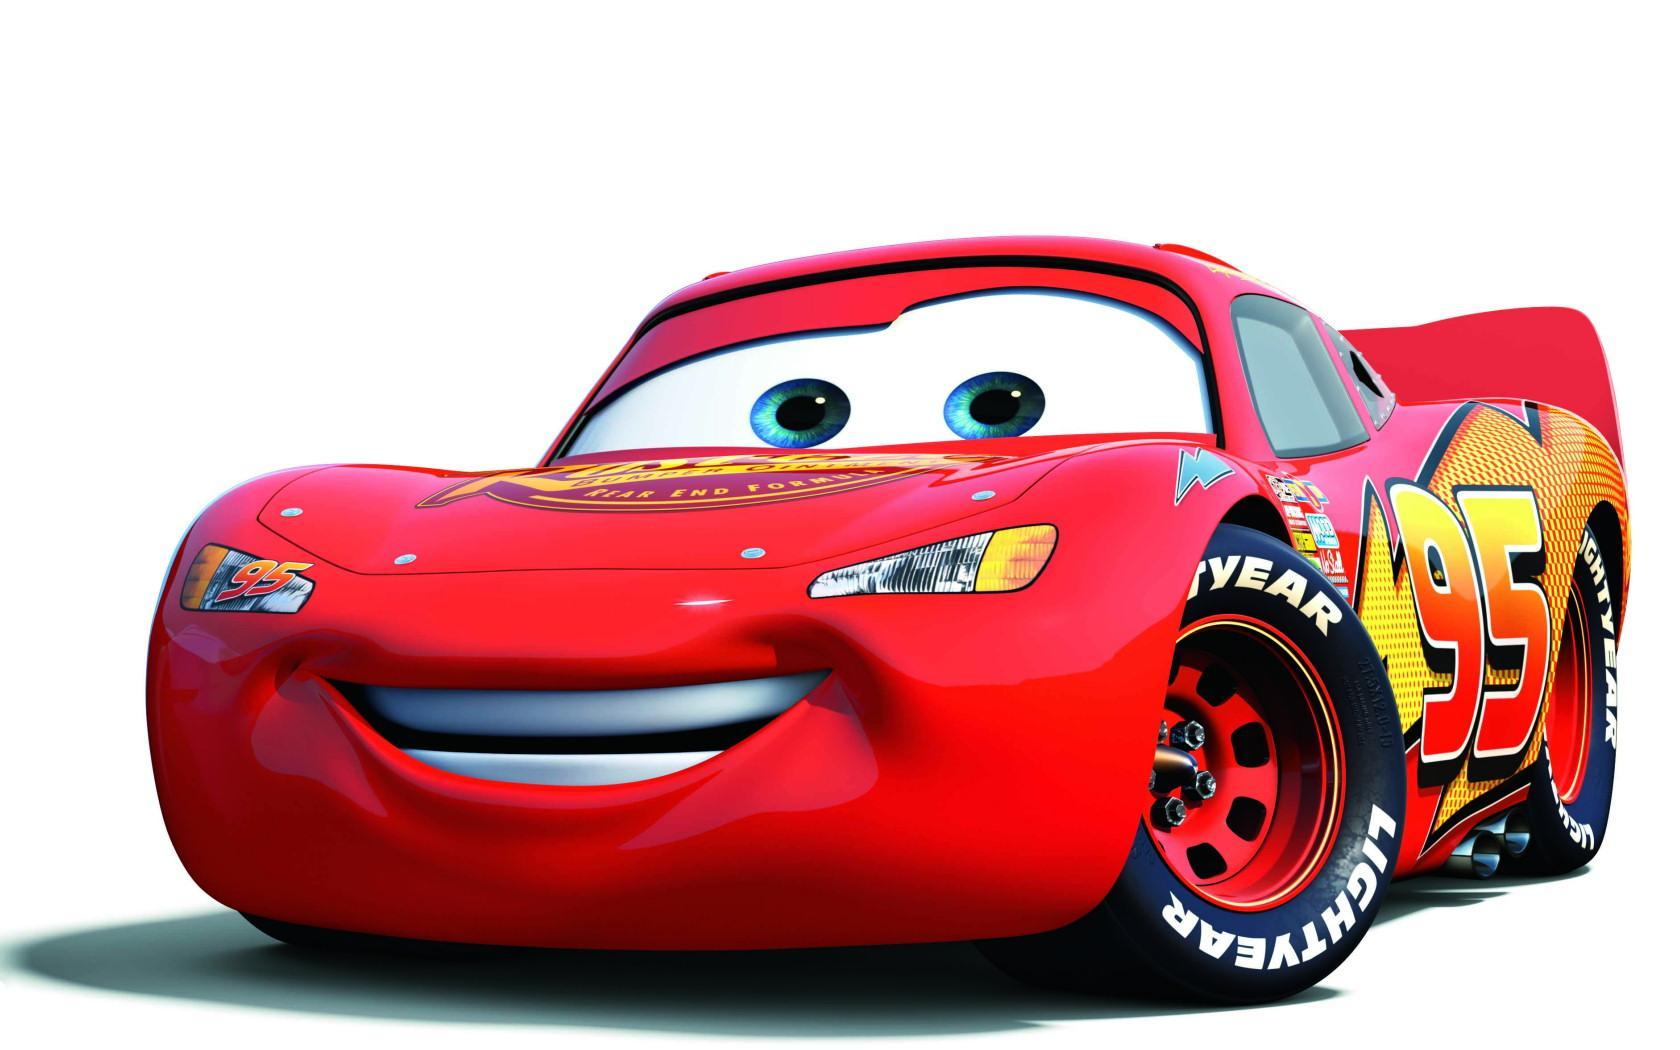 Walt Disney Pixar Cars Clipart. Disney Cars Logo Template Png